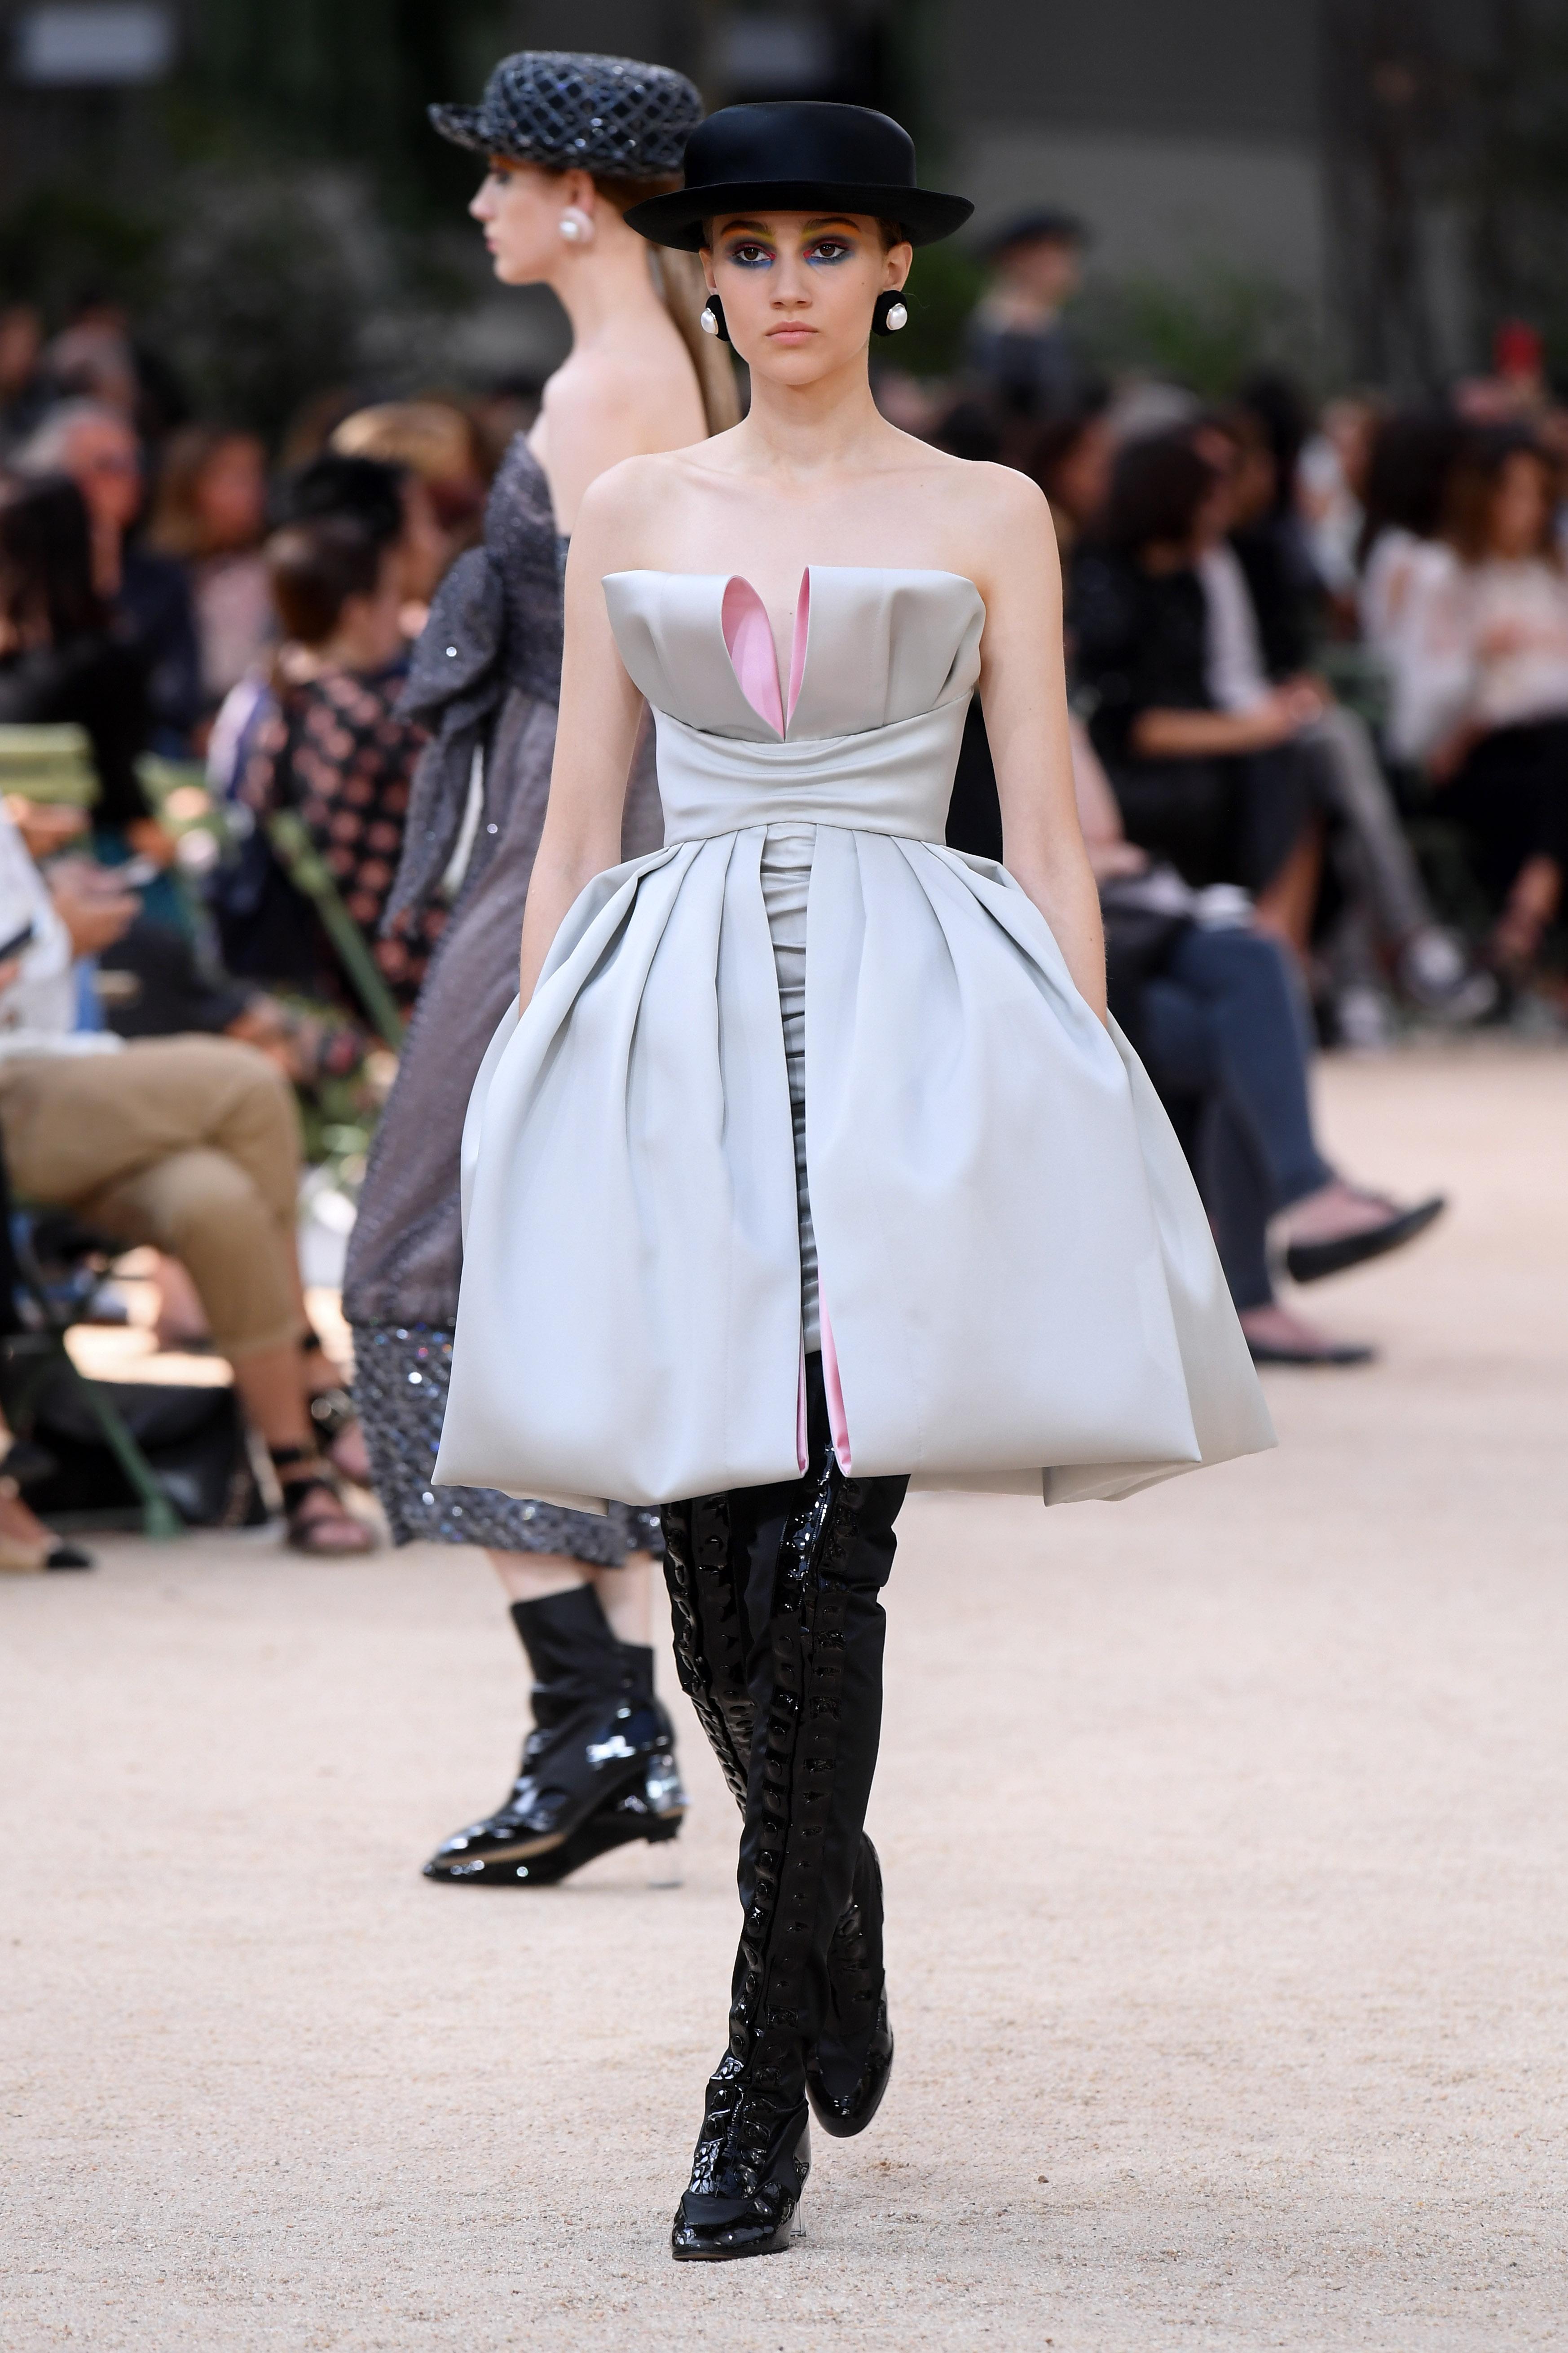 Chanel Väskor Kopia : Chanel byggde kopia av eiffeltornet f?r haute couture